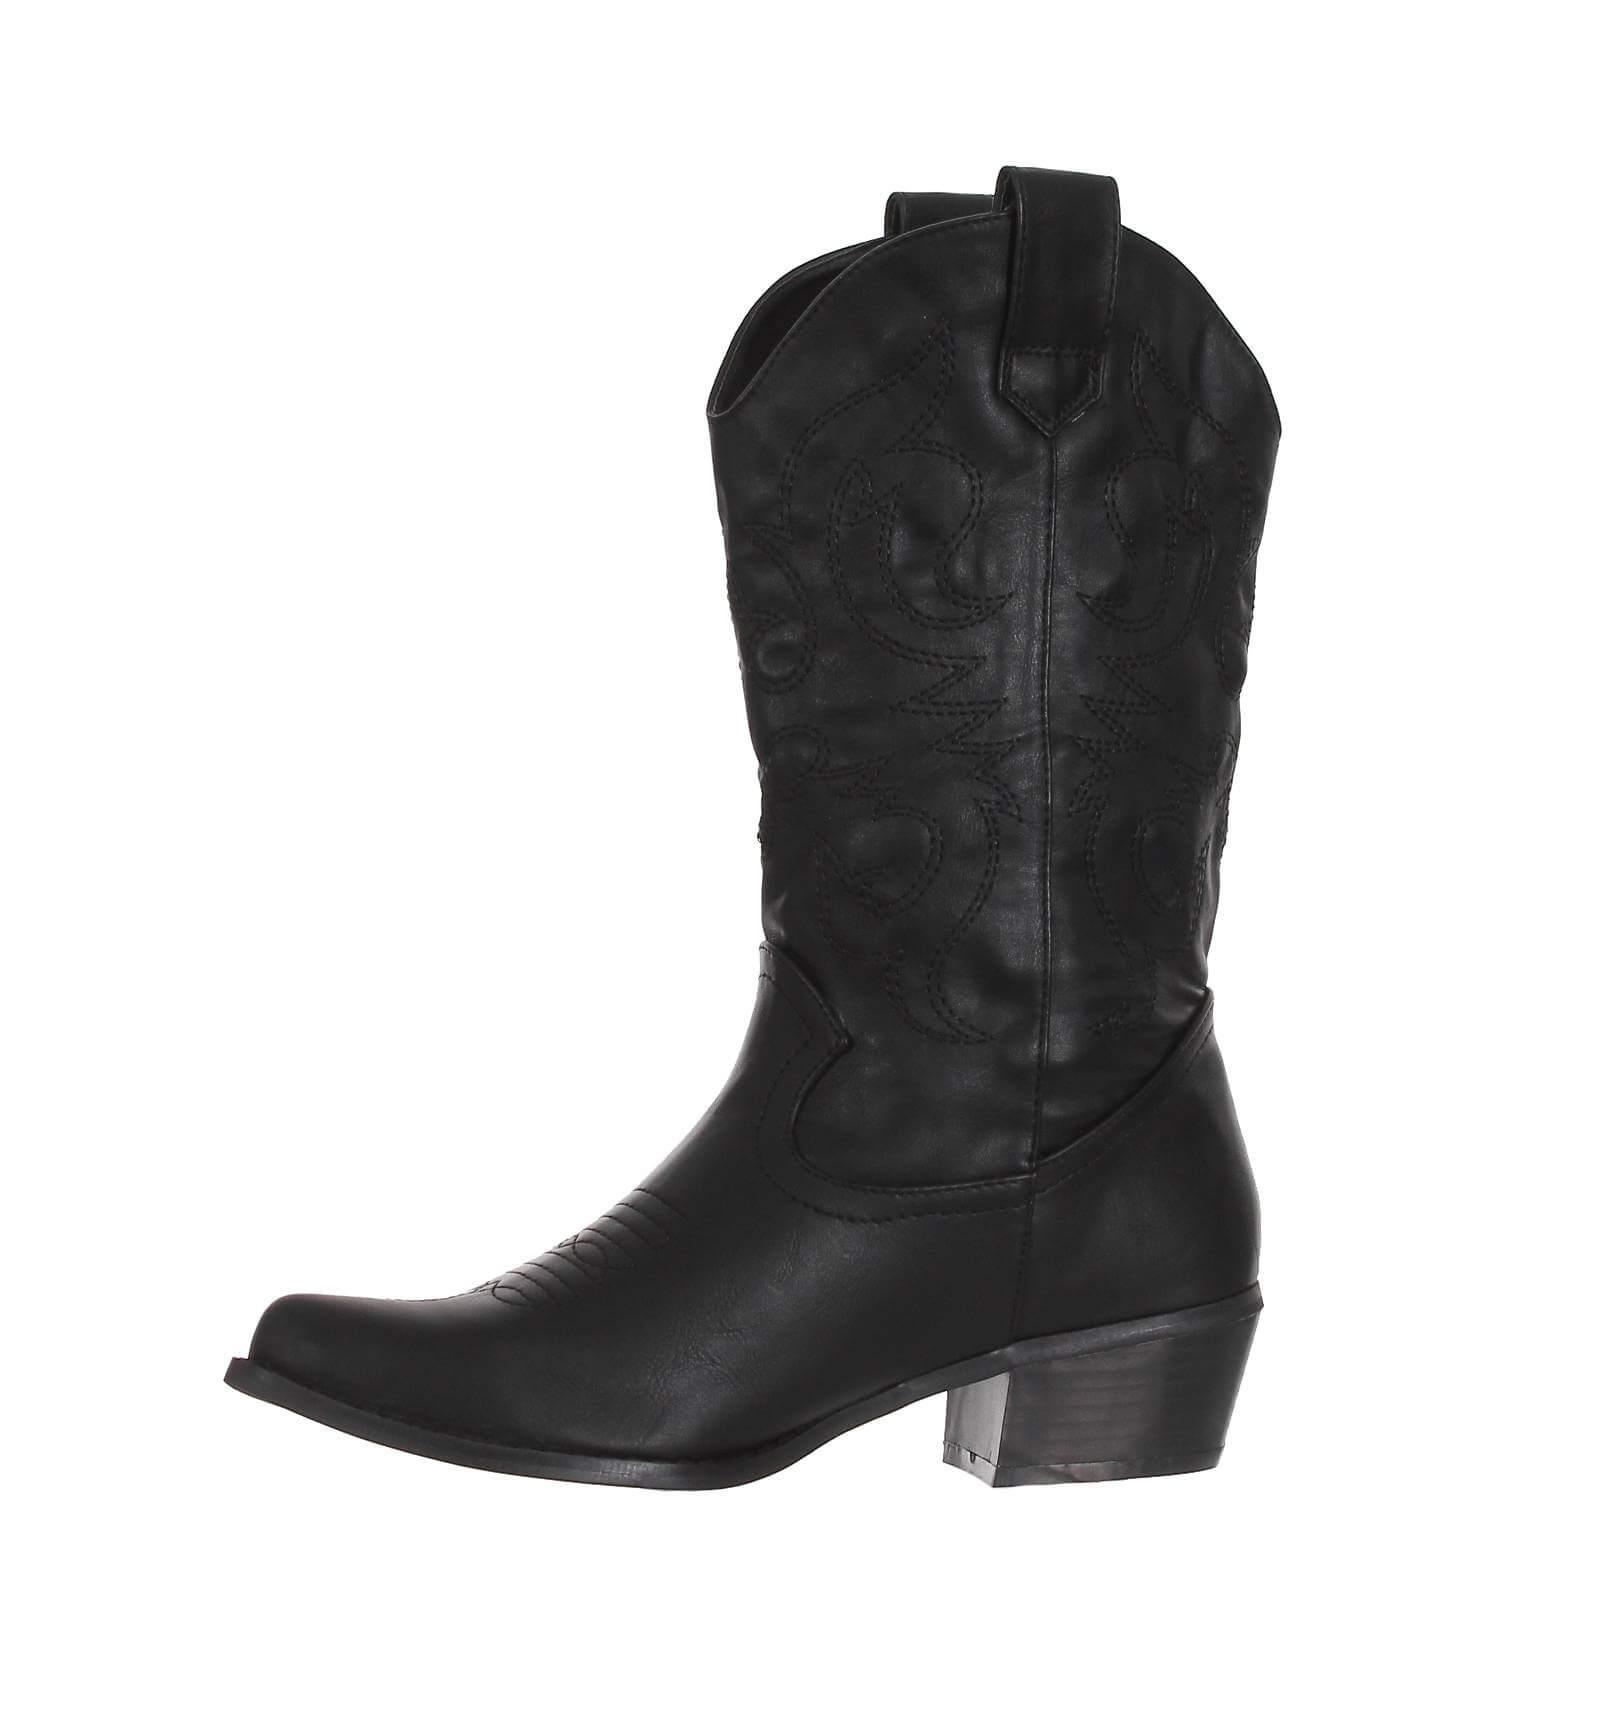 bottes femme simili cuir brod blanc western paris city shoes. Black Bedroom Furniture Sets. Home Design Ideas